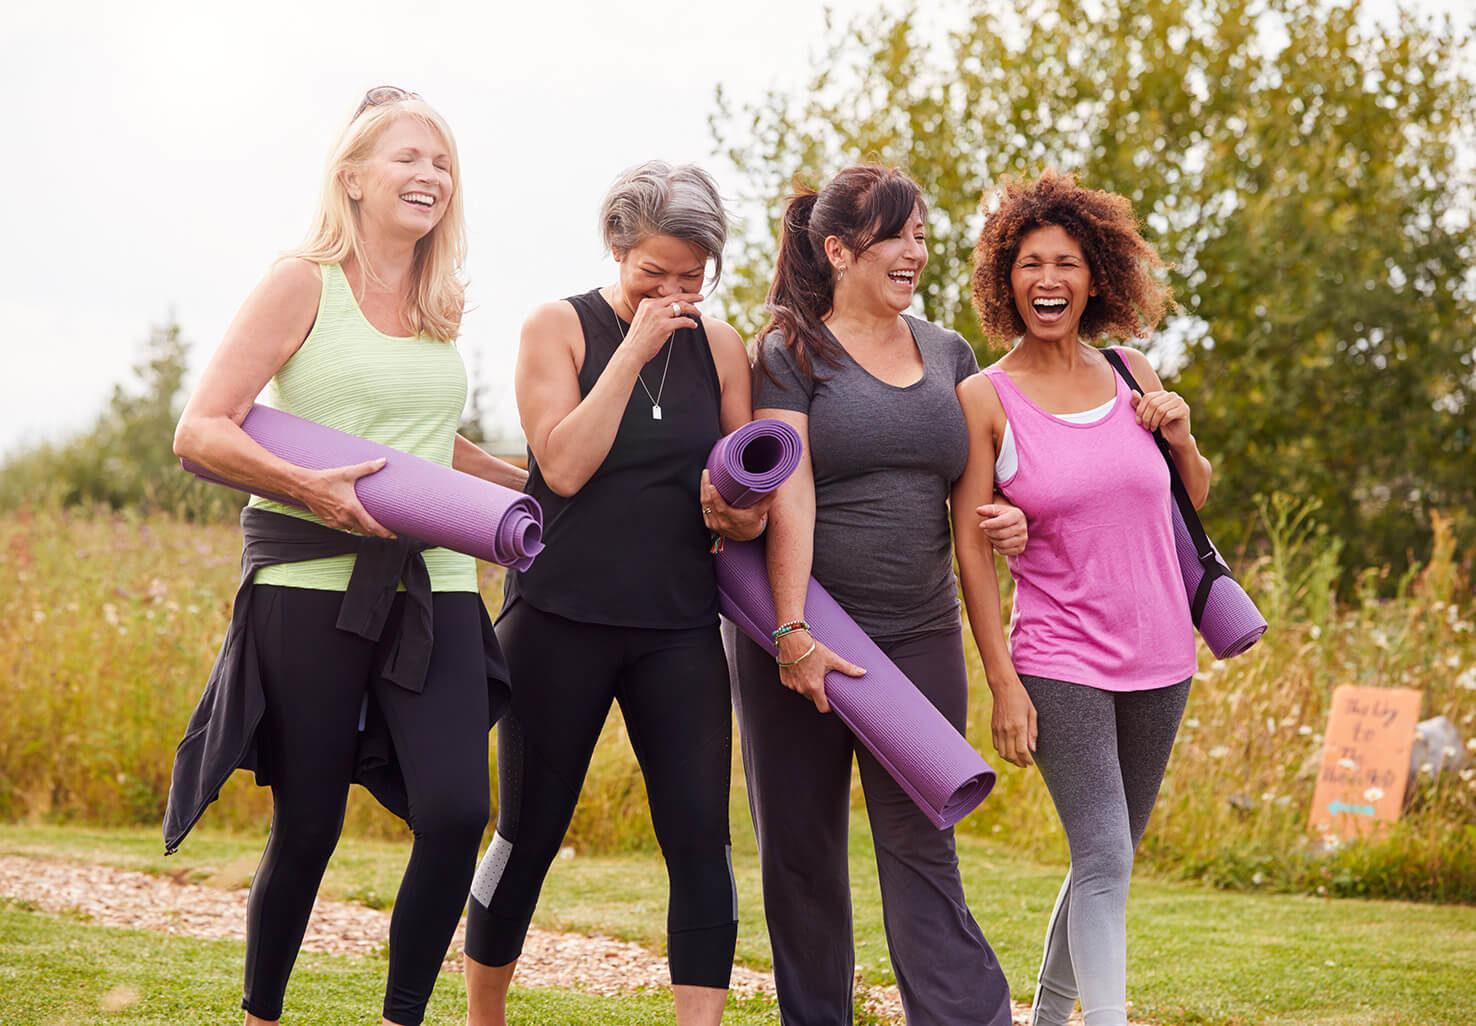 Four women on yoga getaway in Virginia